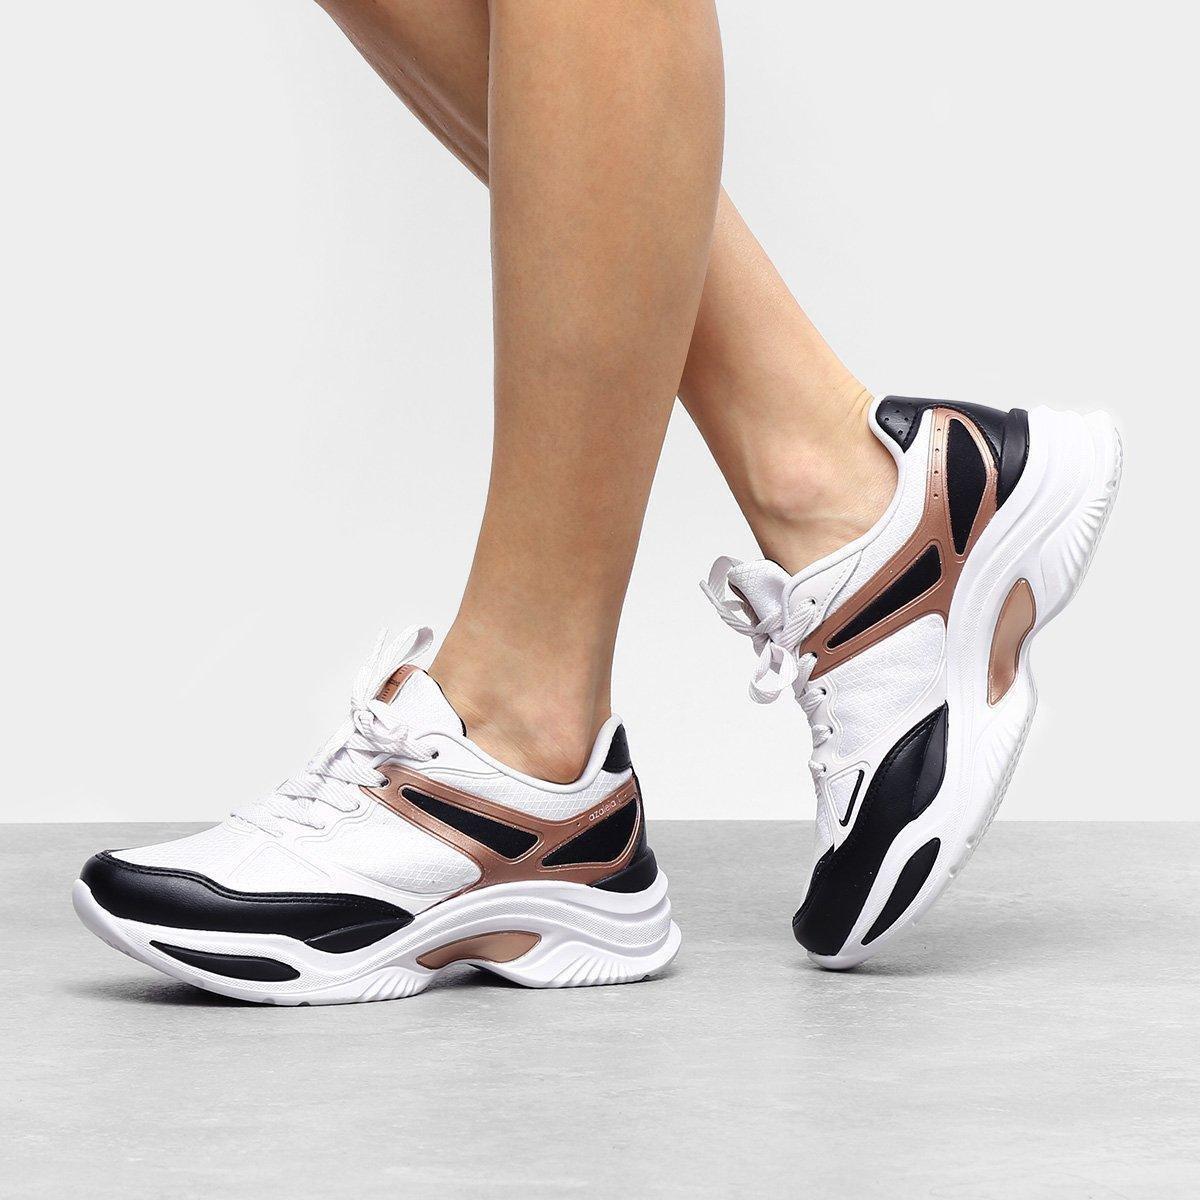 d047bef6a4 Tênis Azaleia Chunky Sneaker Feminino - Branco - Compre Agora